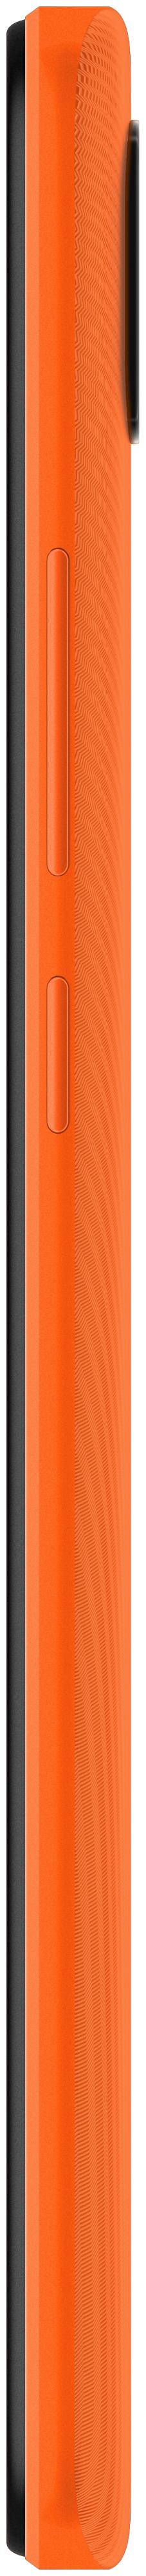 Xiaomi Redmi 9C 3/64GB (NFC) - операционная система: Android 10